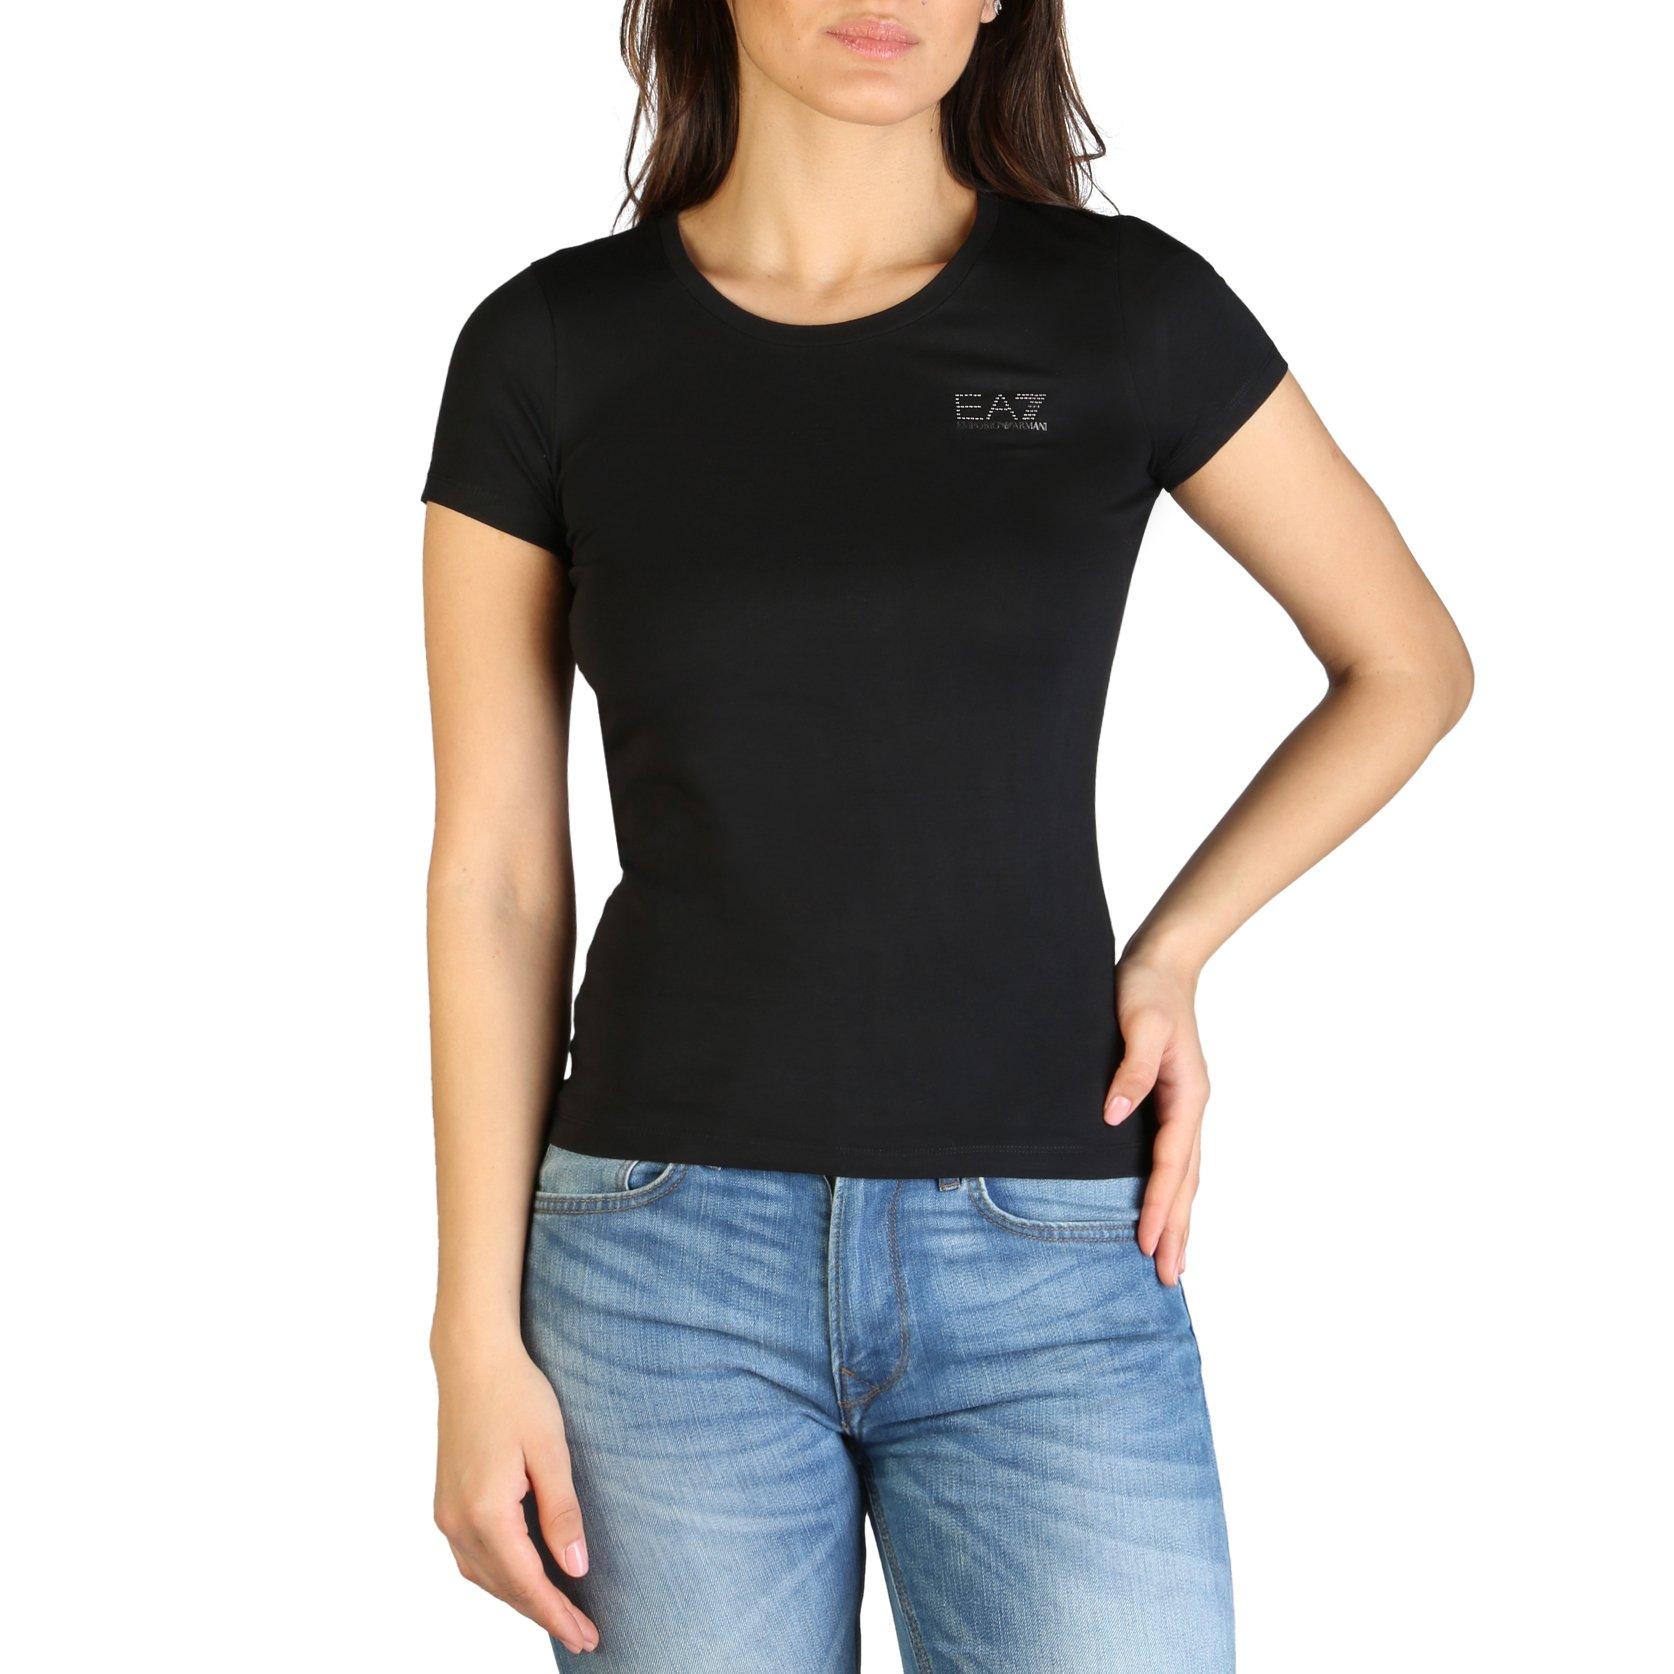 EA7 Women's T-Shirt Various Colours 7VTT01_TJ4FZ - black XXS